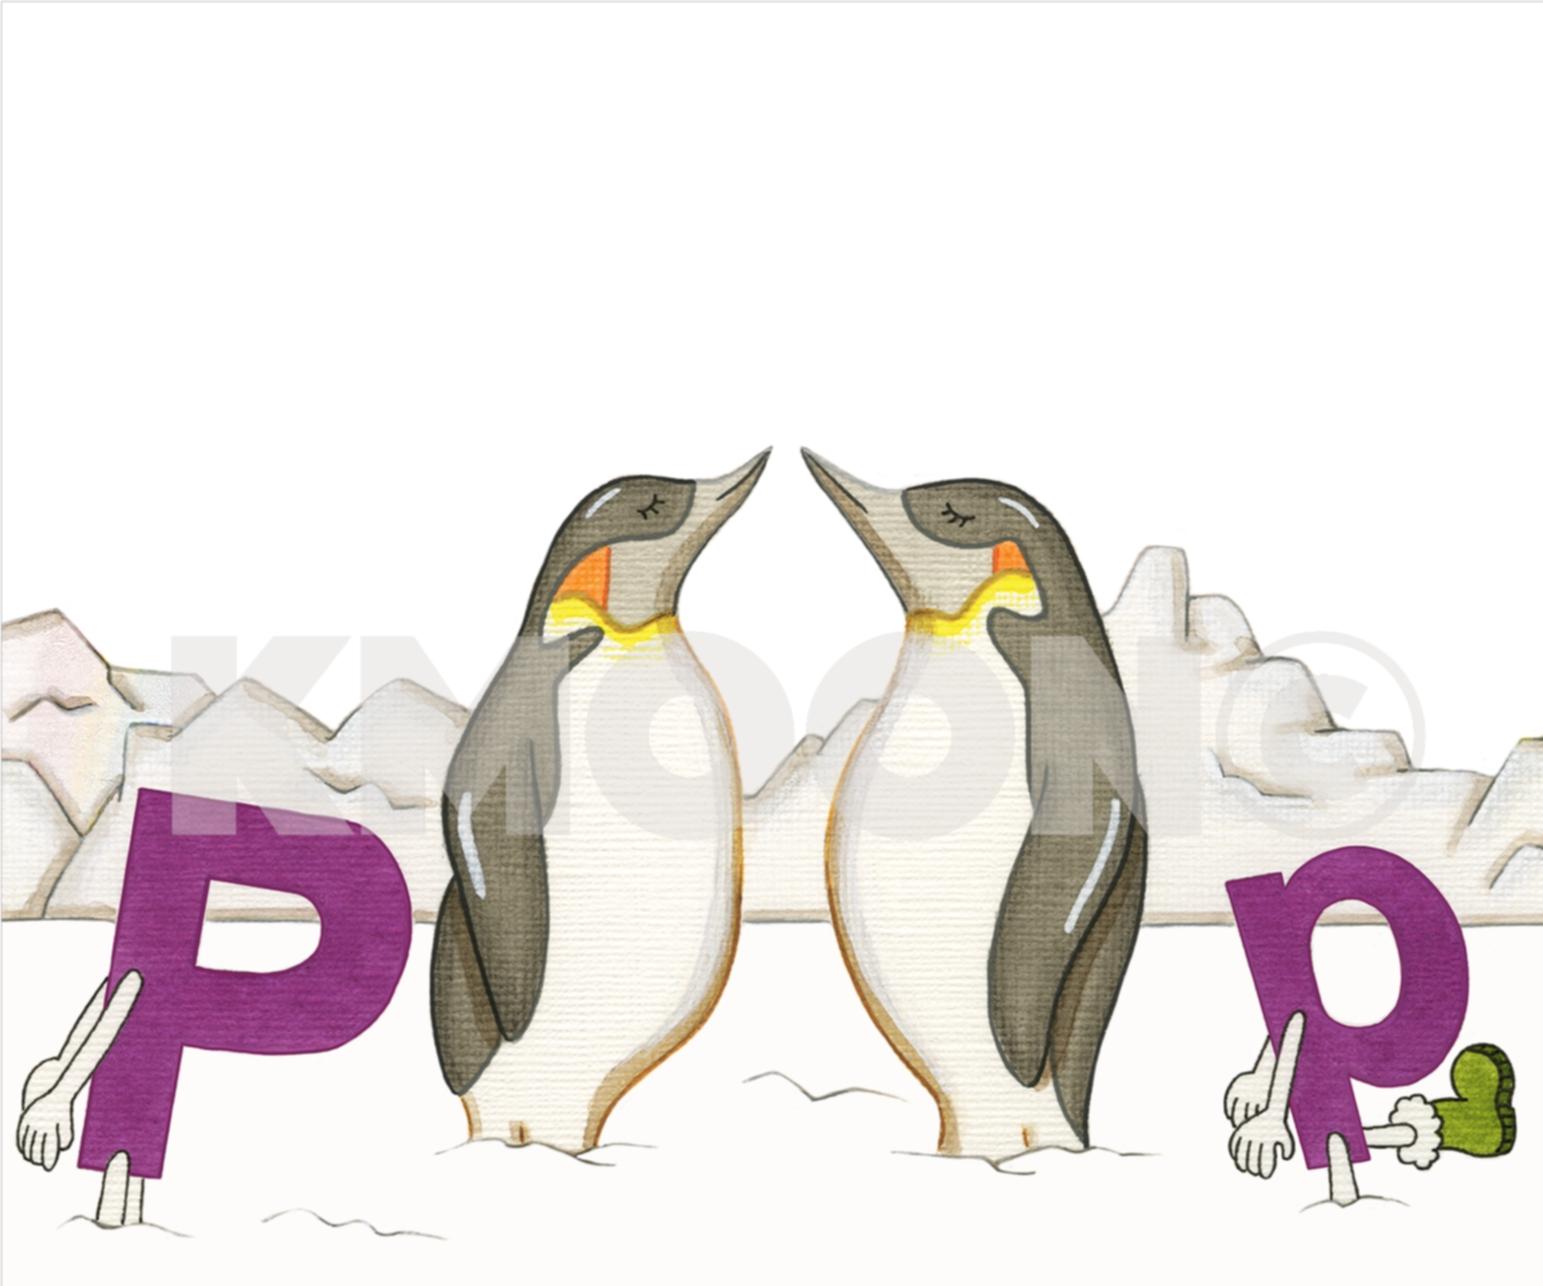 Pp is for ... penguin